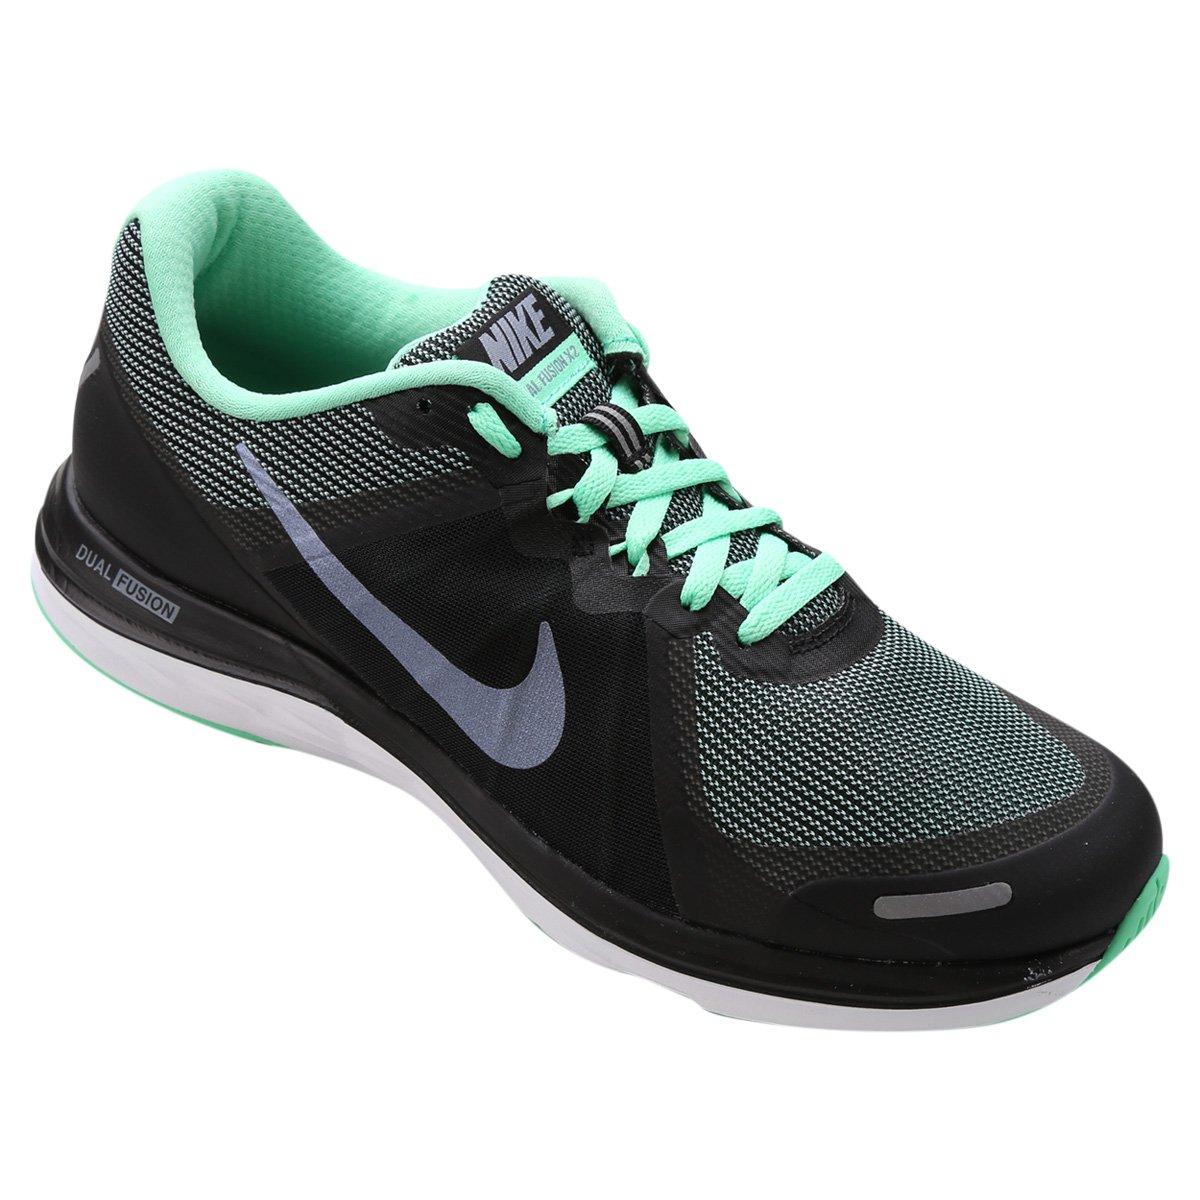 Tênis Nike Dual Fusion X 2 Feminino - Compre Agora  7a2b6b3d518